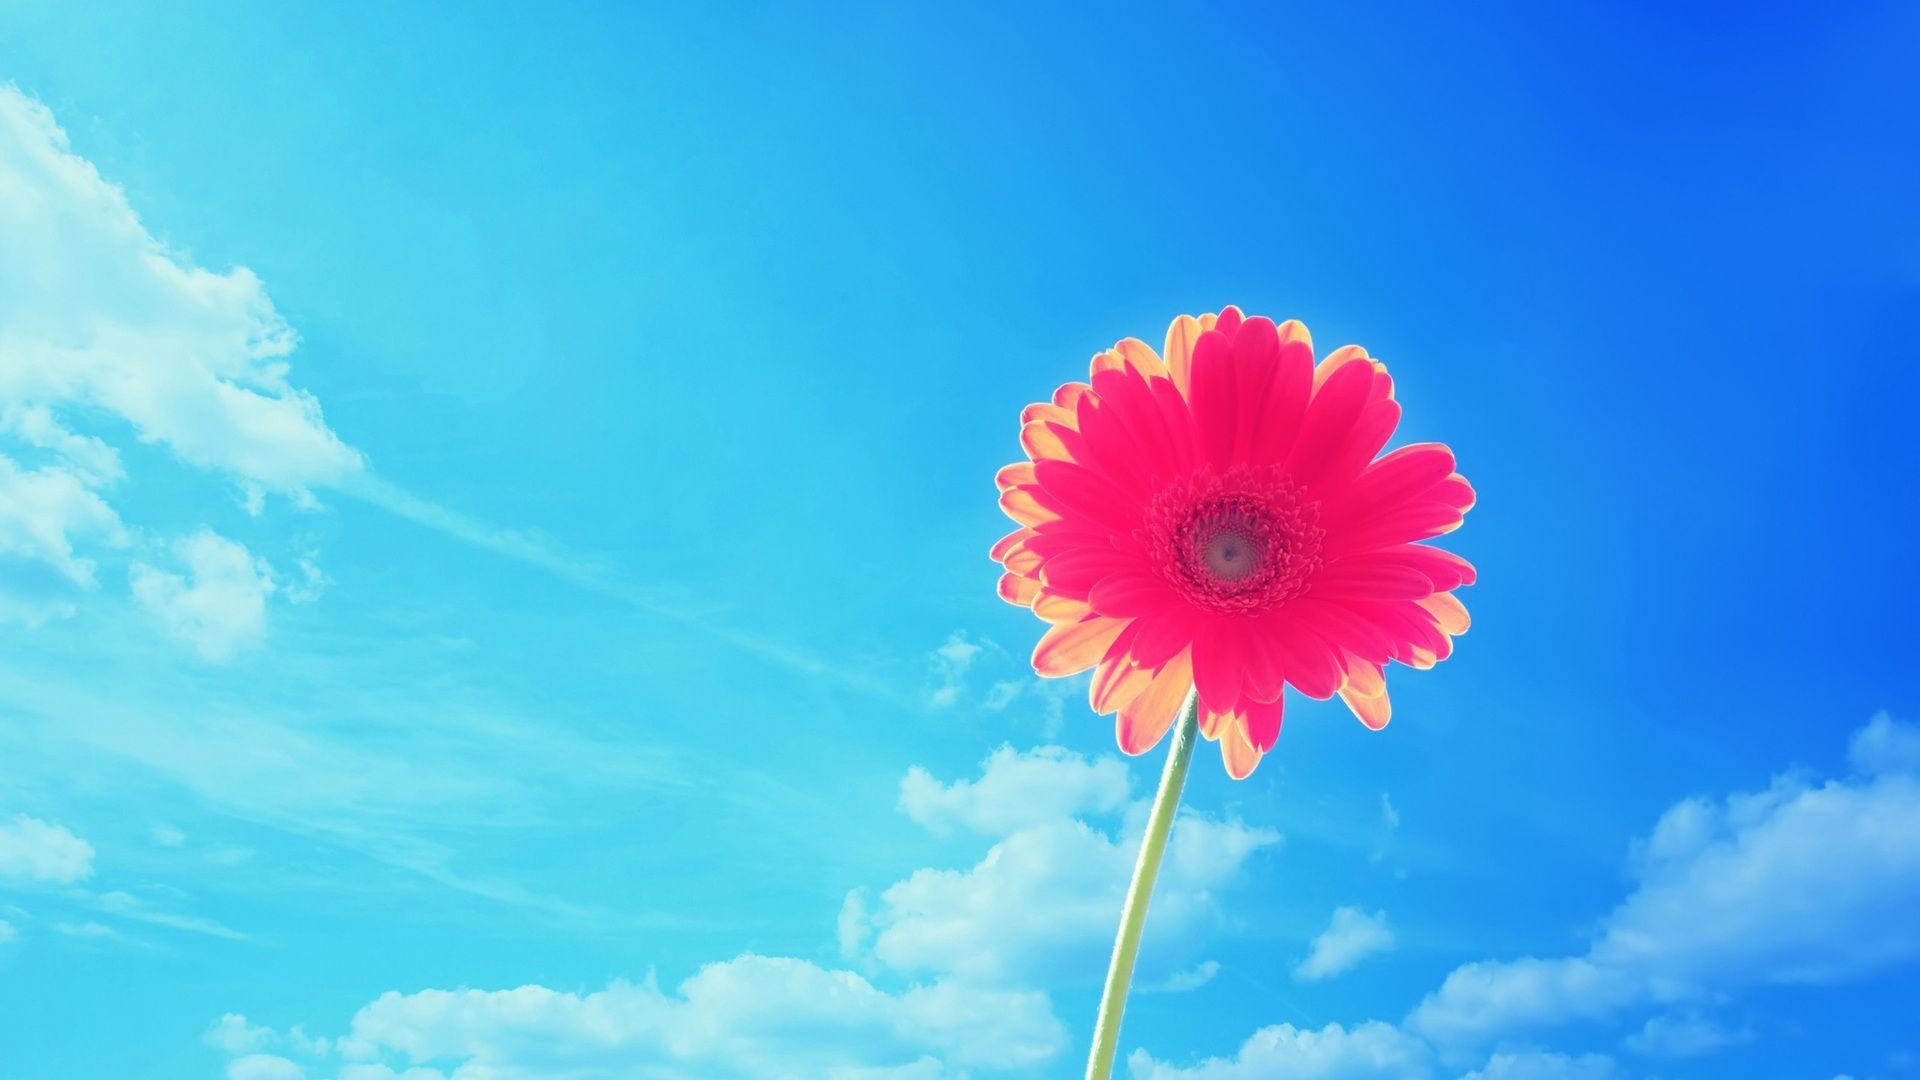 find out flower in the sky wallpaper on httphdpicorner com